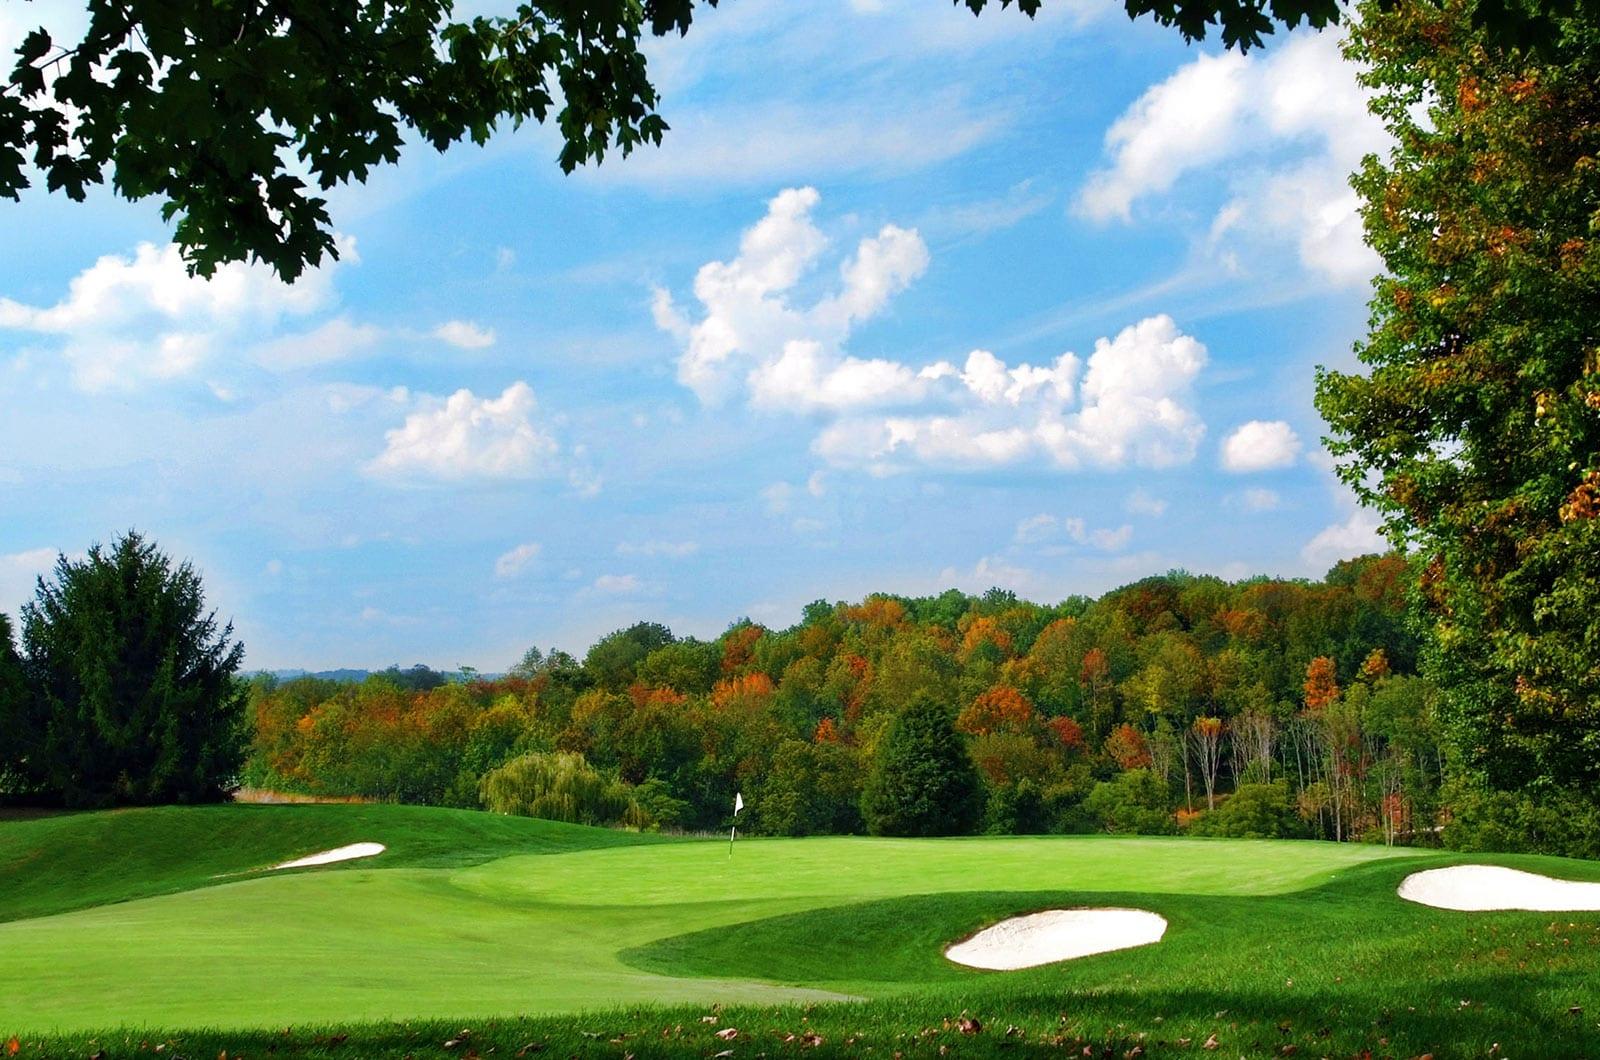 Golf Course 360 Virtual Tour | Virtual Tours | 360 Tours | 360 Photography | Virtual Tour Company | Golf Courses